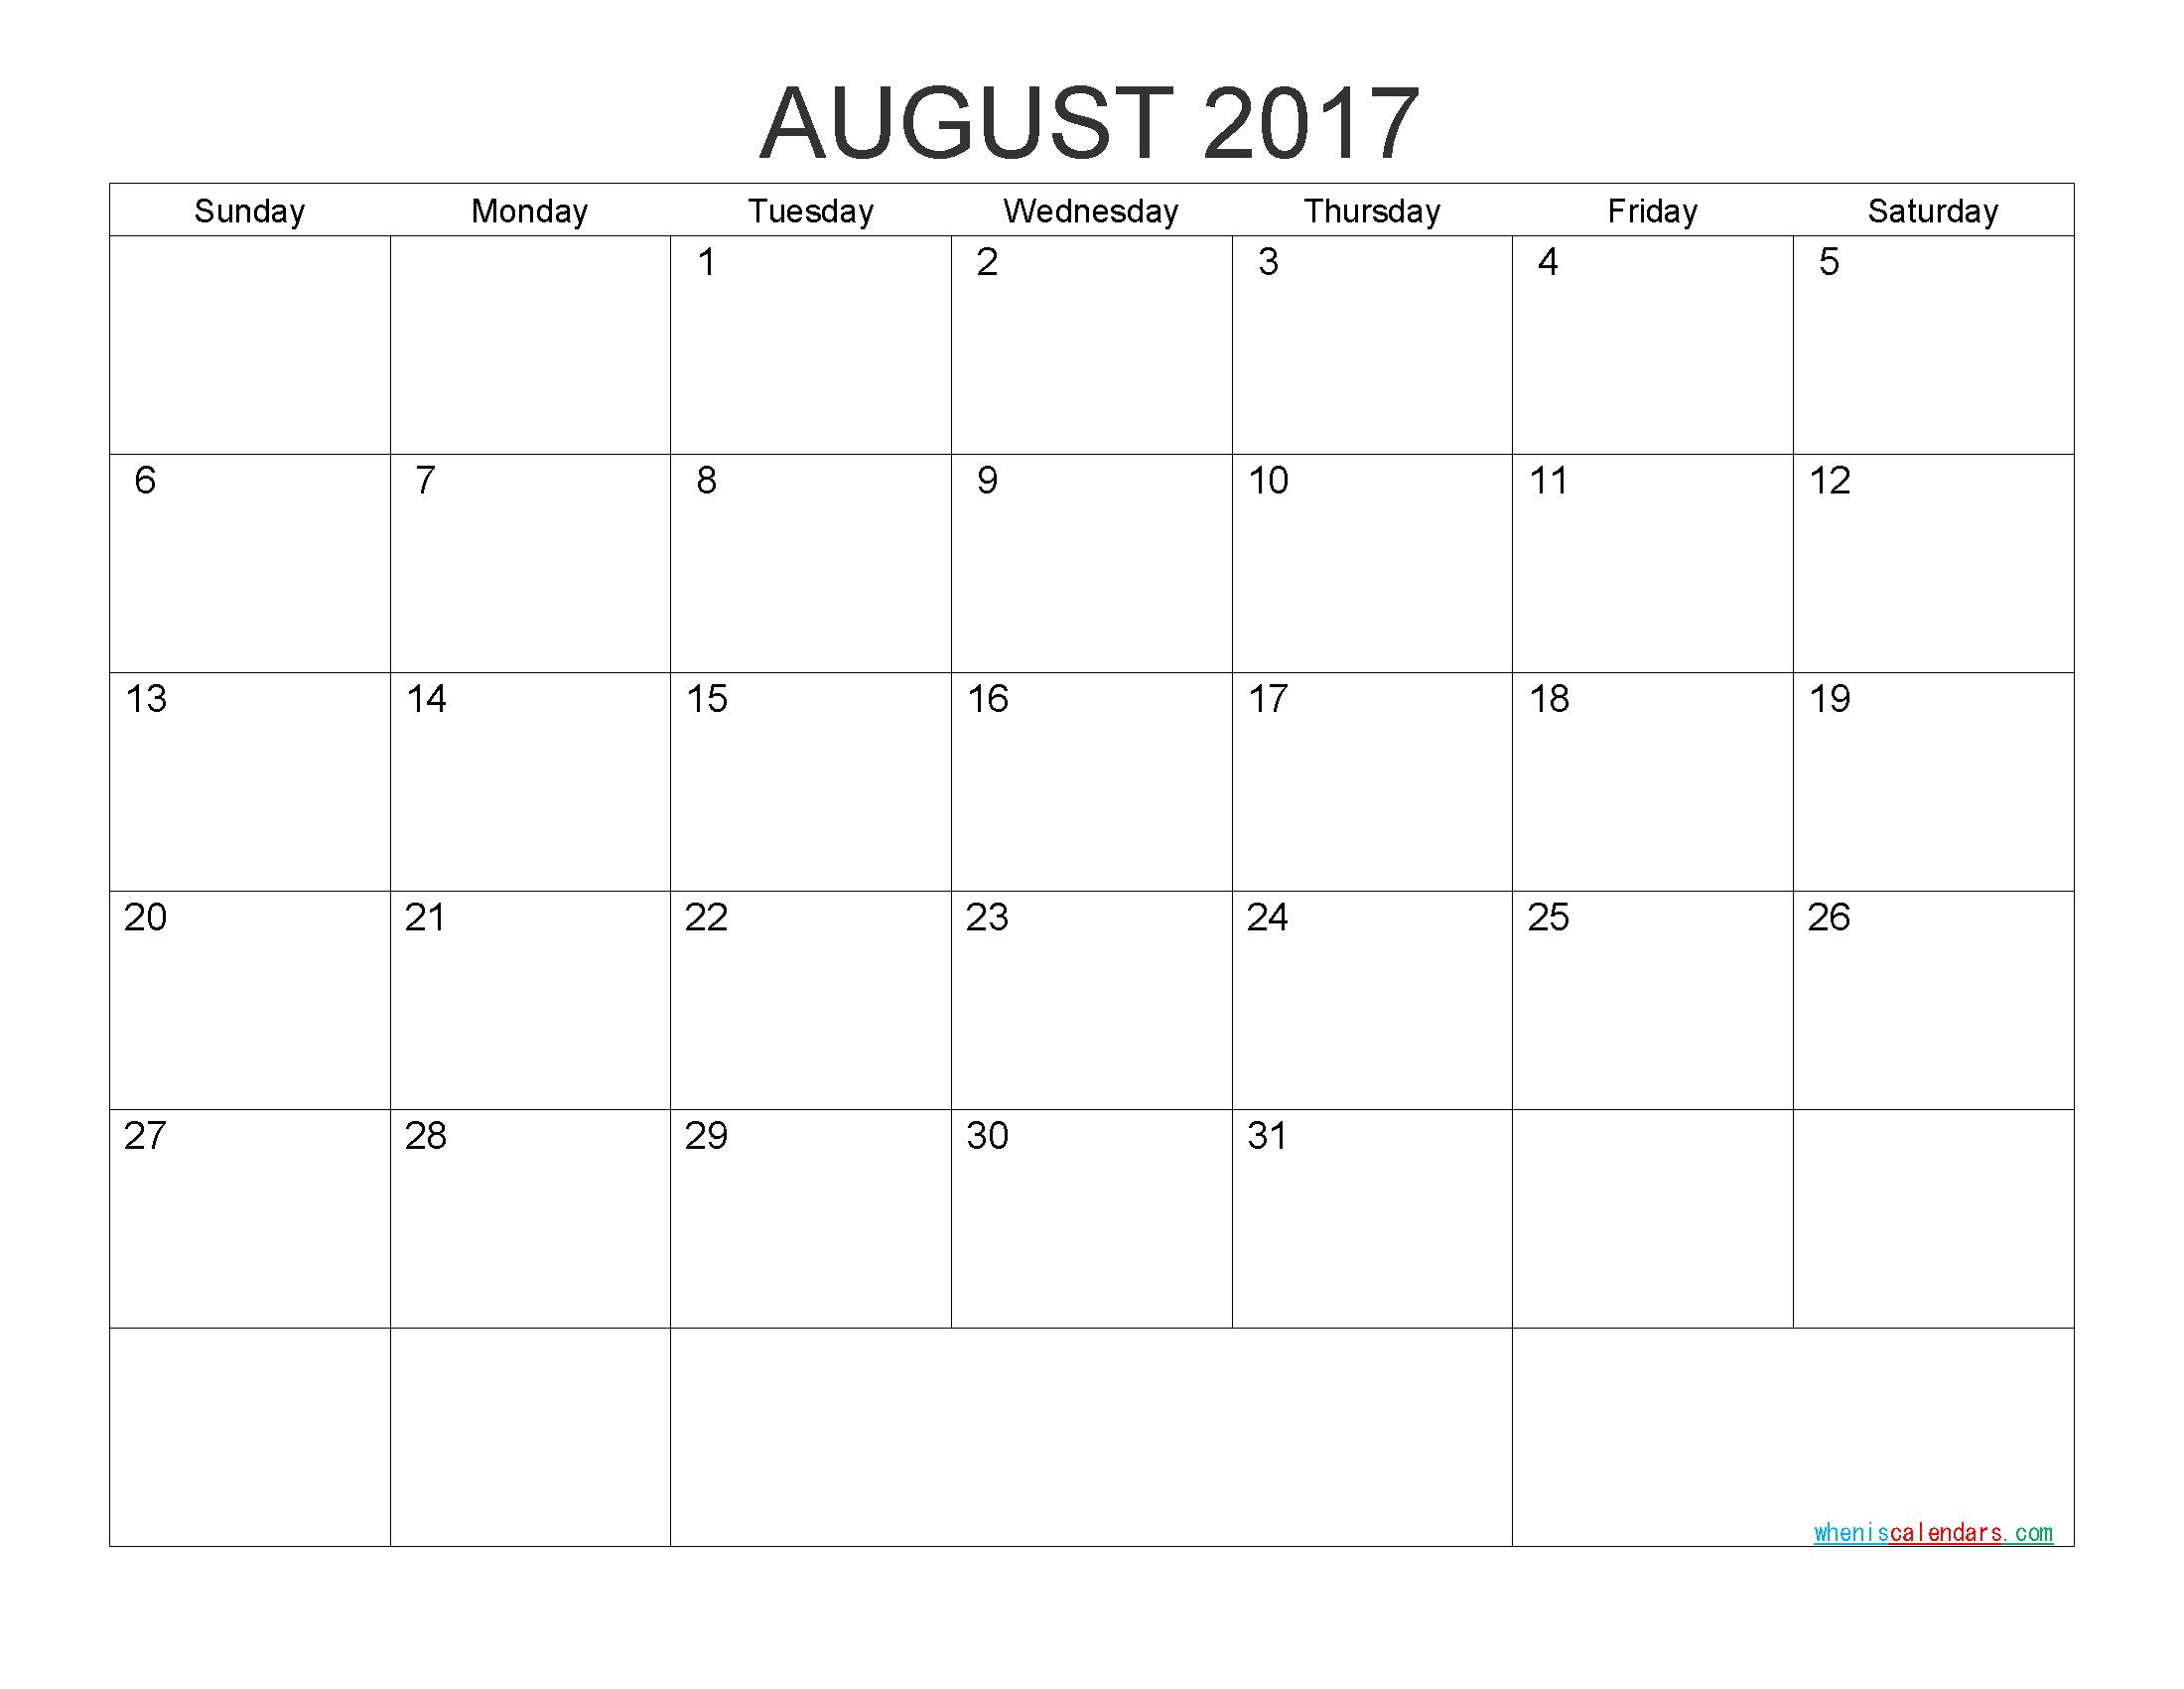 Free Printable Calendar 2017 Monthly Calendarpdf, Image | Free regarding Printable Calendar Templates August Through December